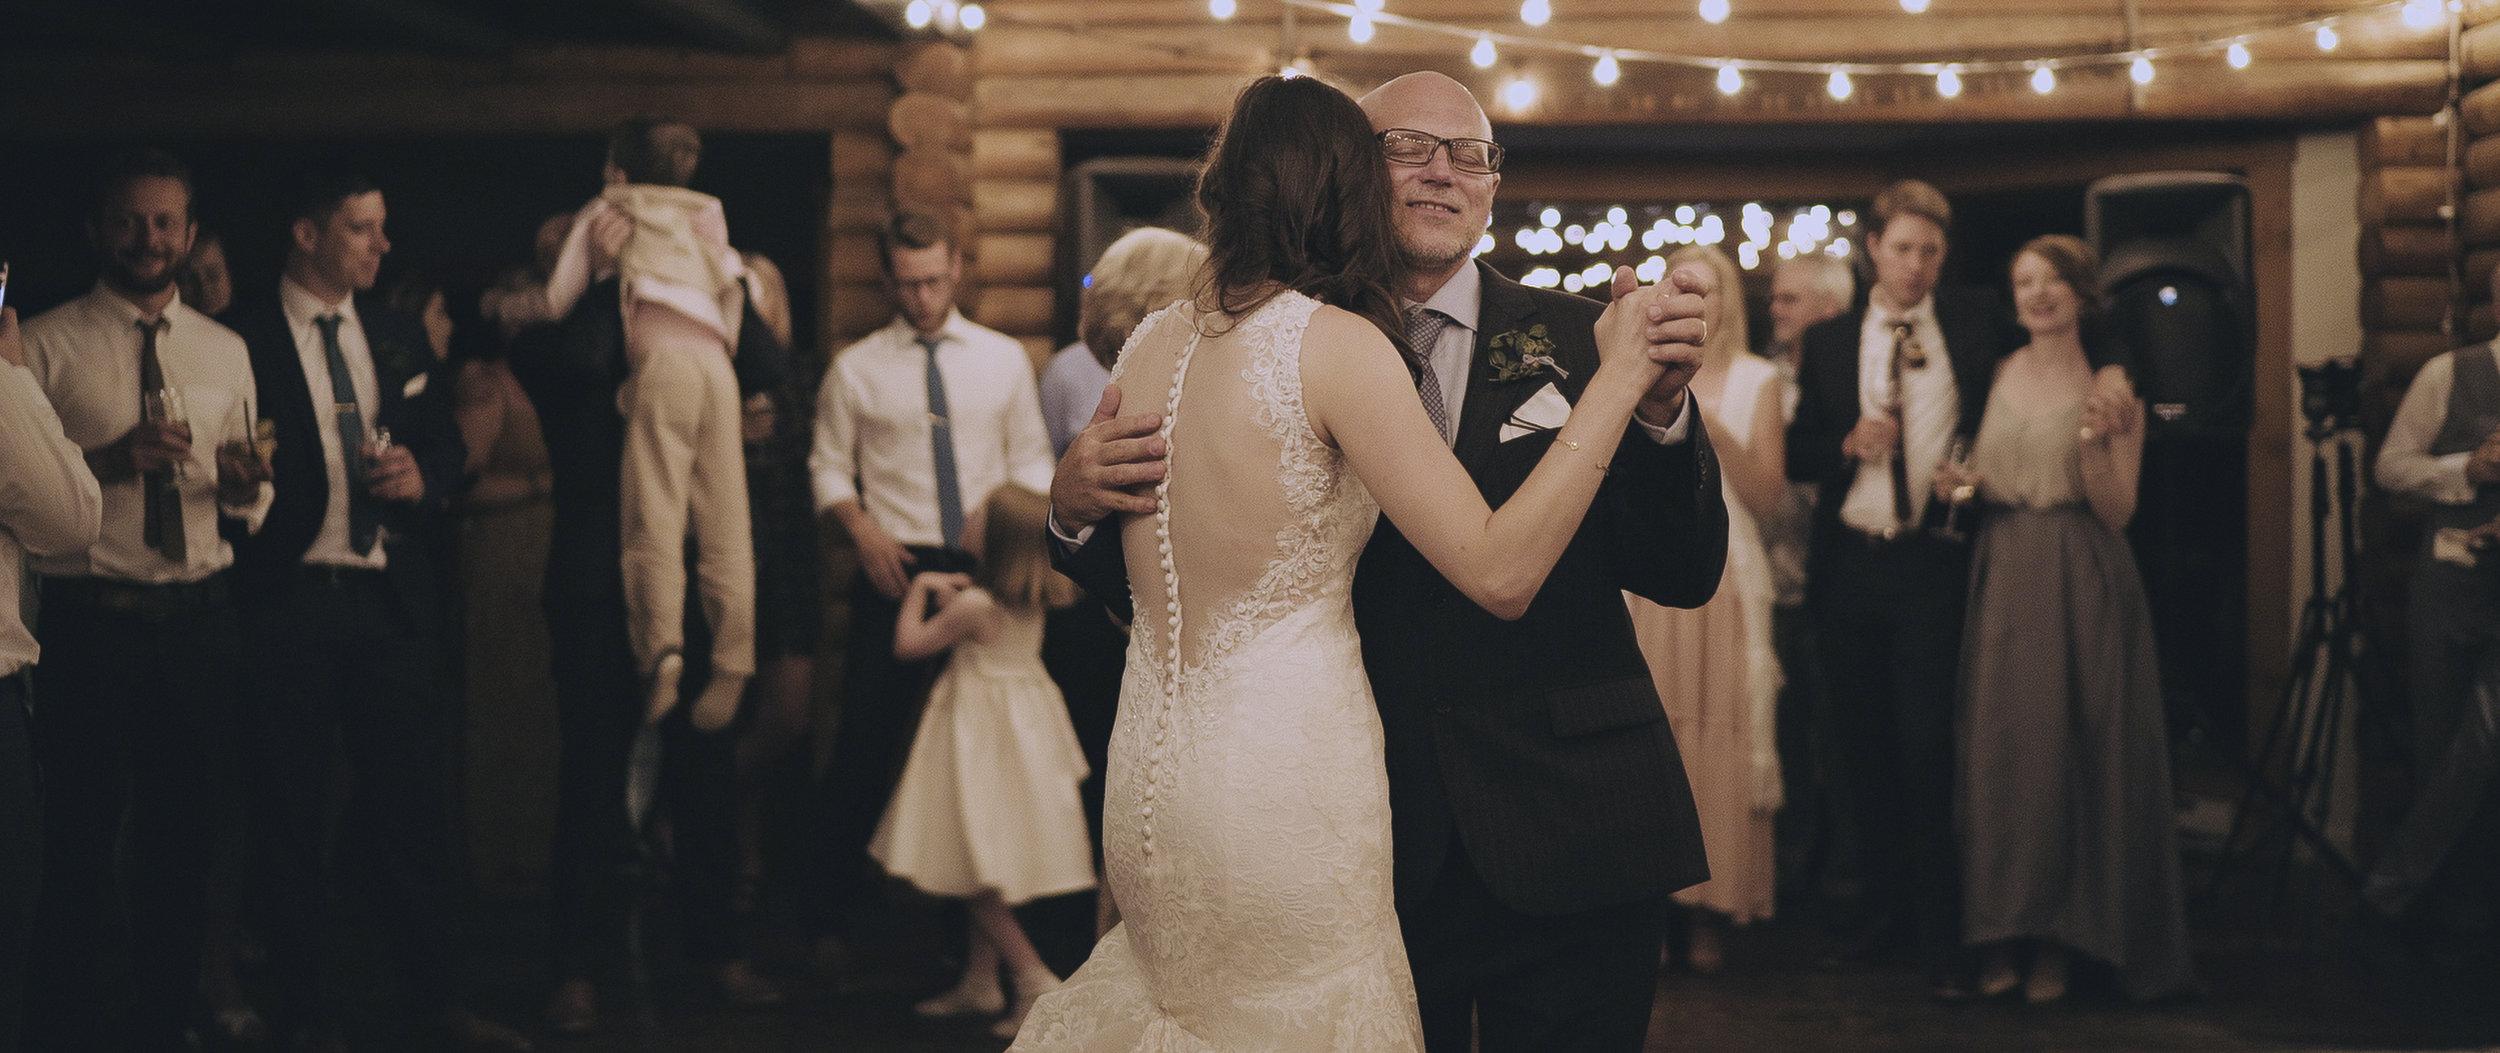 BC Wedding Videography-3.jpg